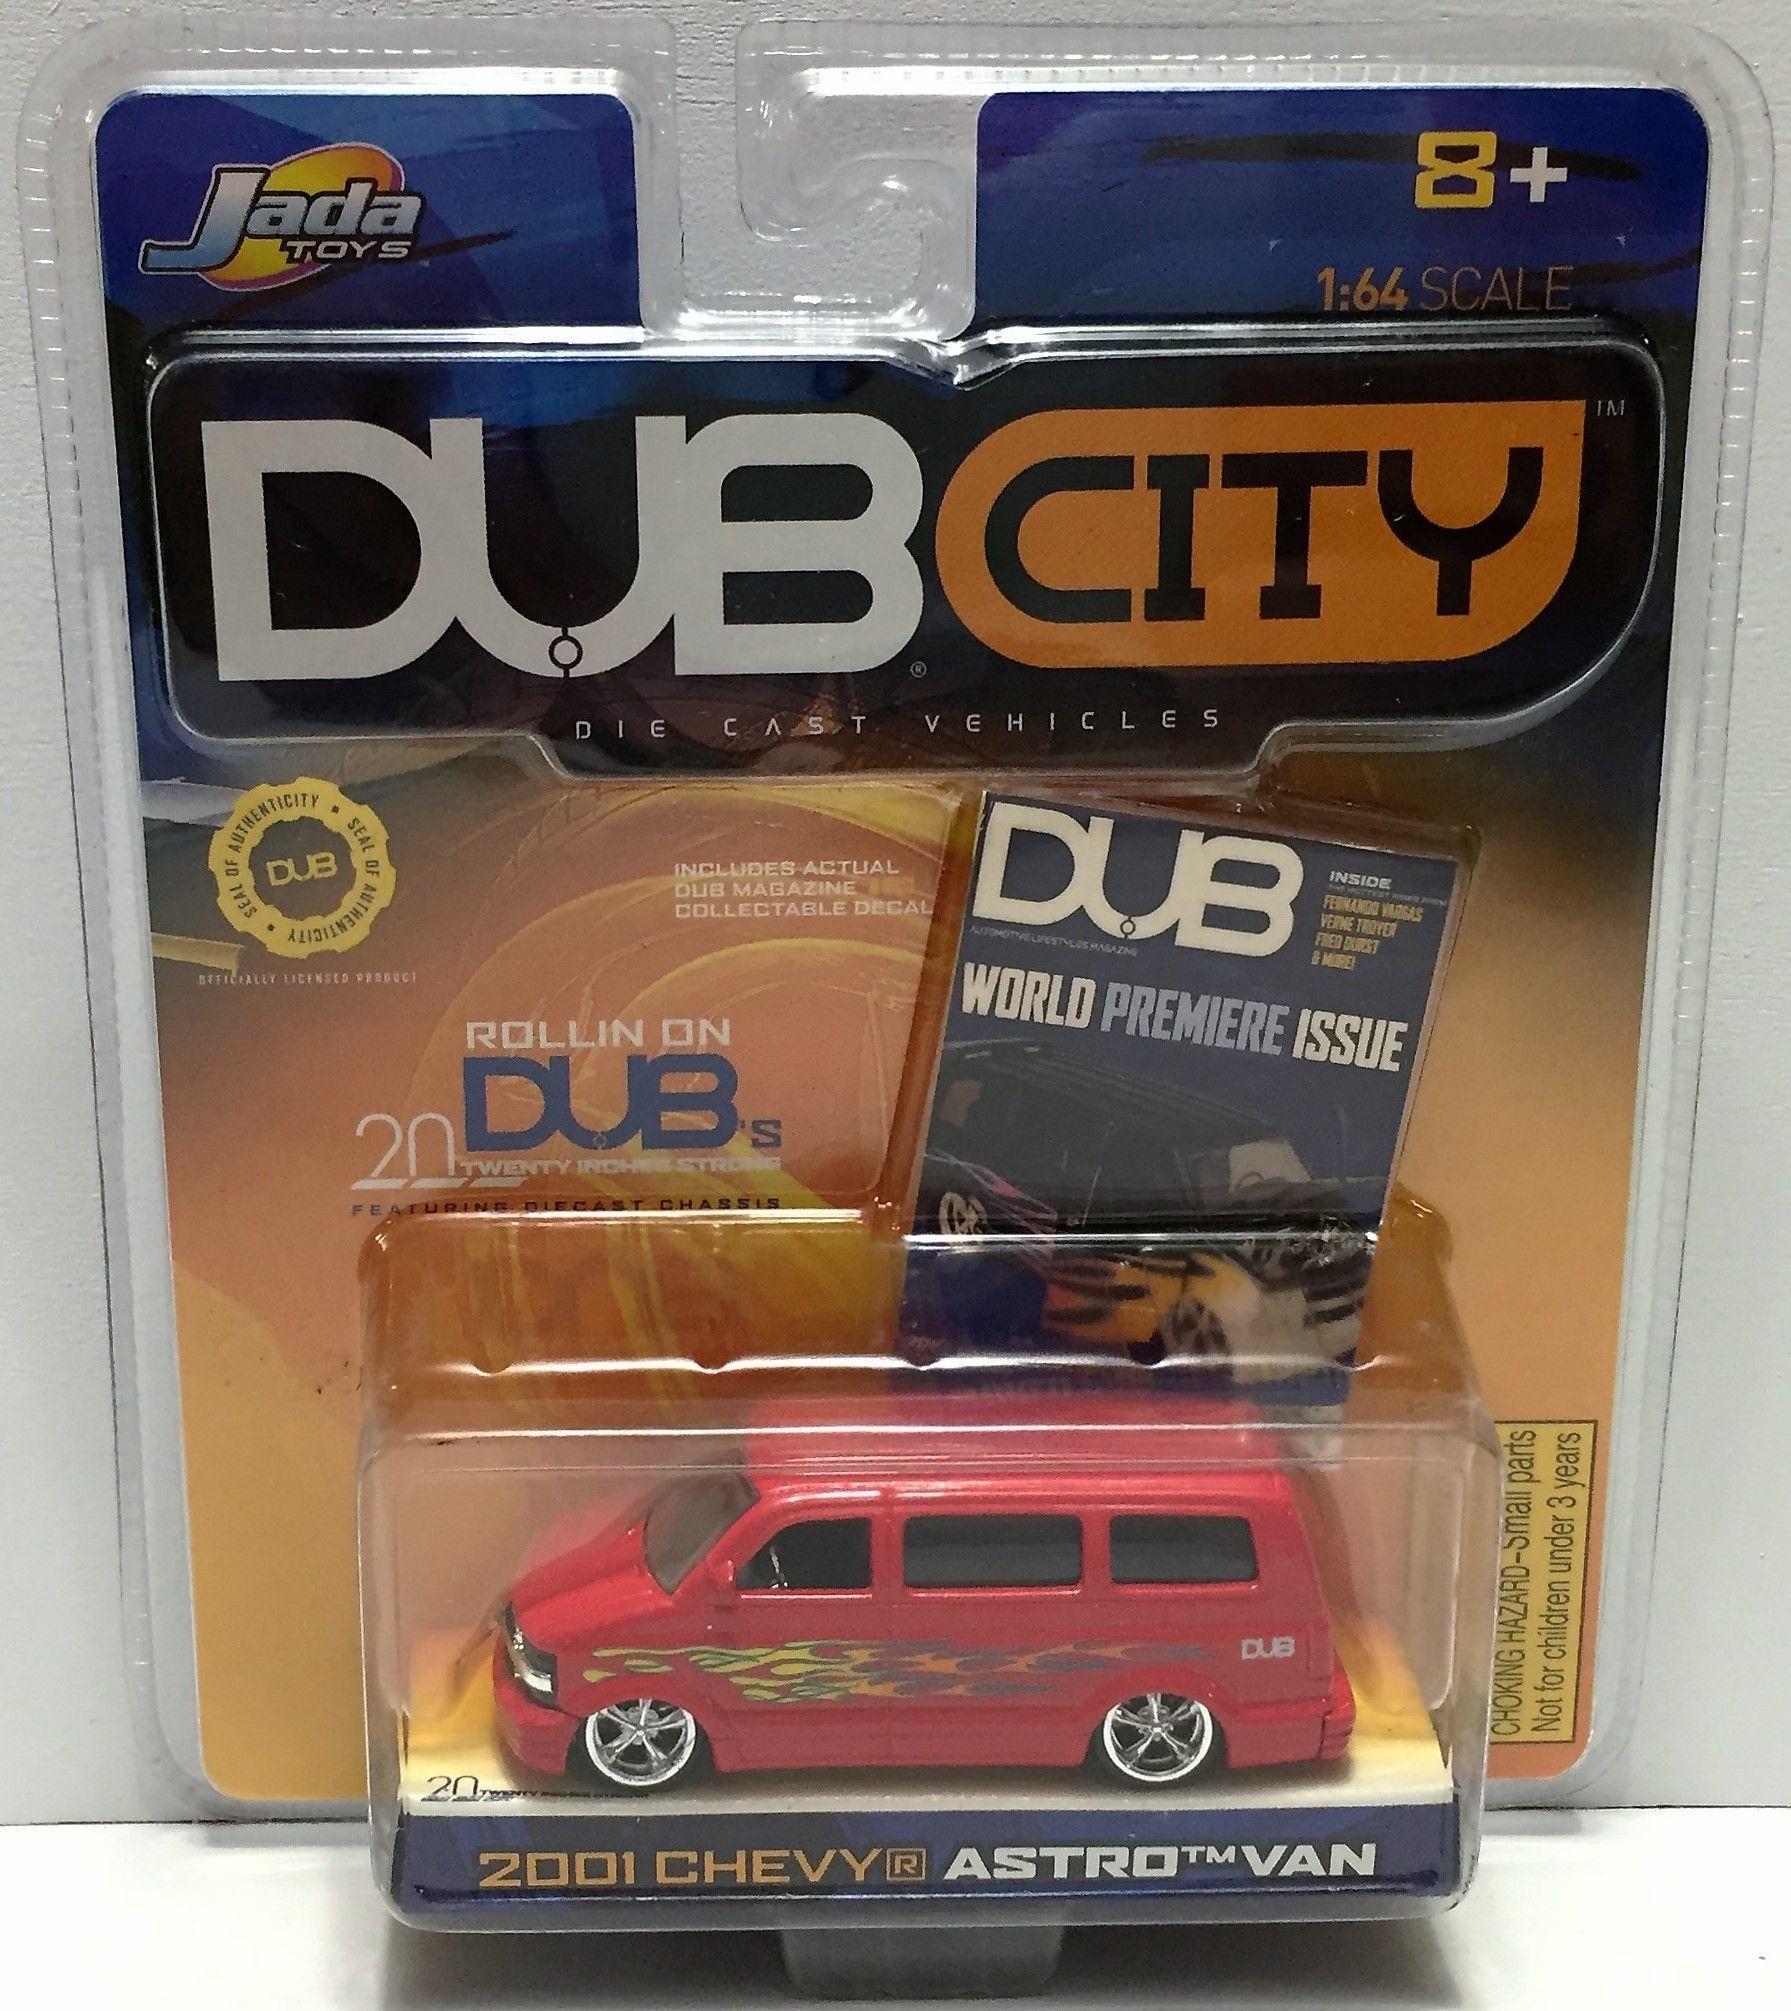 TAS034141) - 2001 Jada Toys Dub City Die-Cast Vehicles - 2001 Chevy ...